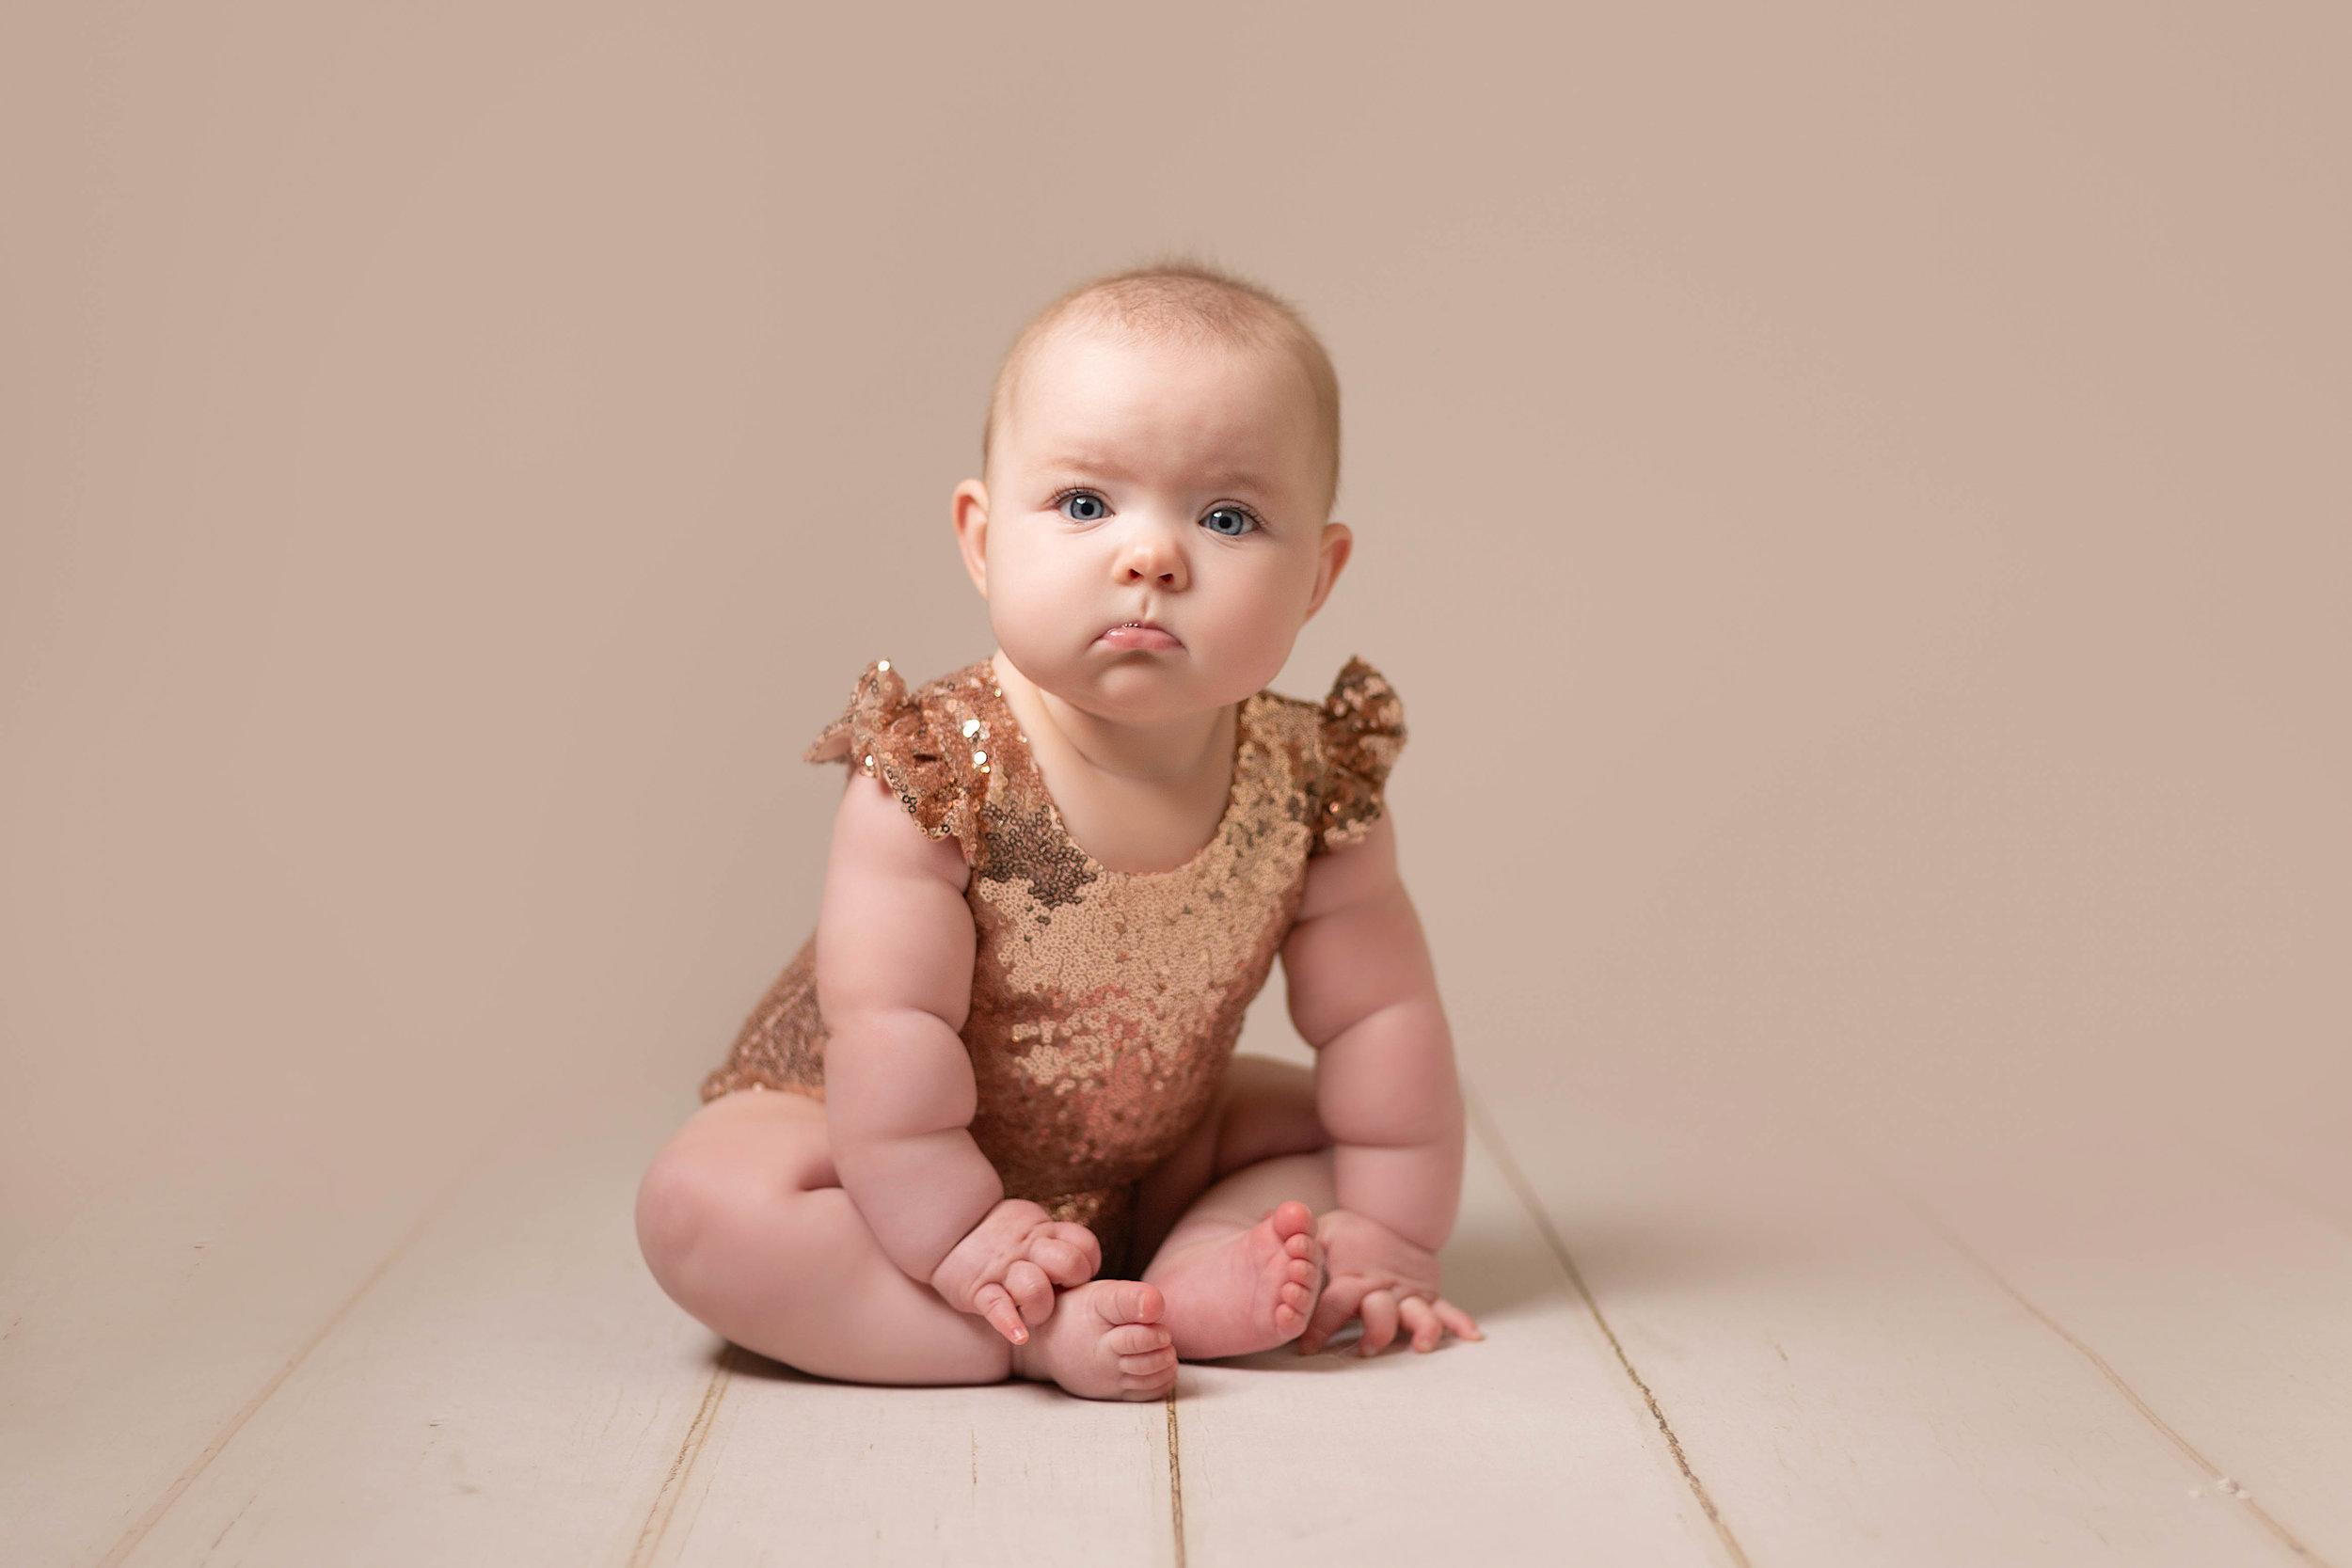 LEA-COOPER-PHOTOGRAPHY-CHILD-PHOTOGRAPHY-WILLENHALL-CHILDREN-PHOTOGRAPHER-WOLVERHAMPTON-BILSTON-WEDNESBURY-KIDS-PHOTOGRAPHER-SITTER-SESSION-MILESTONE--4.JPG